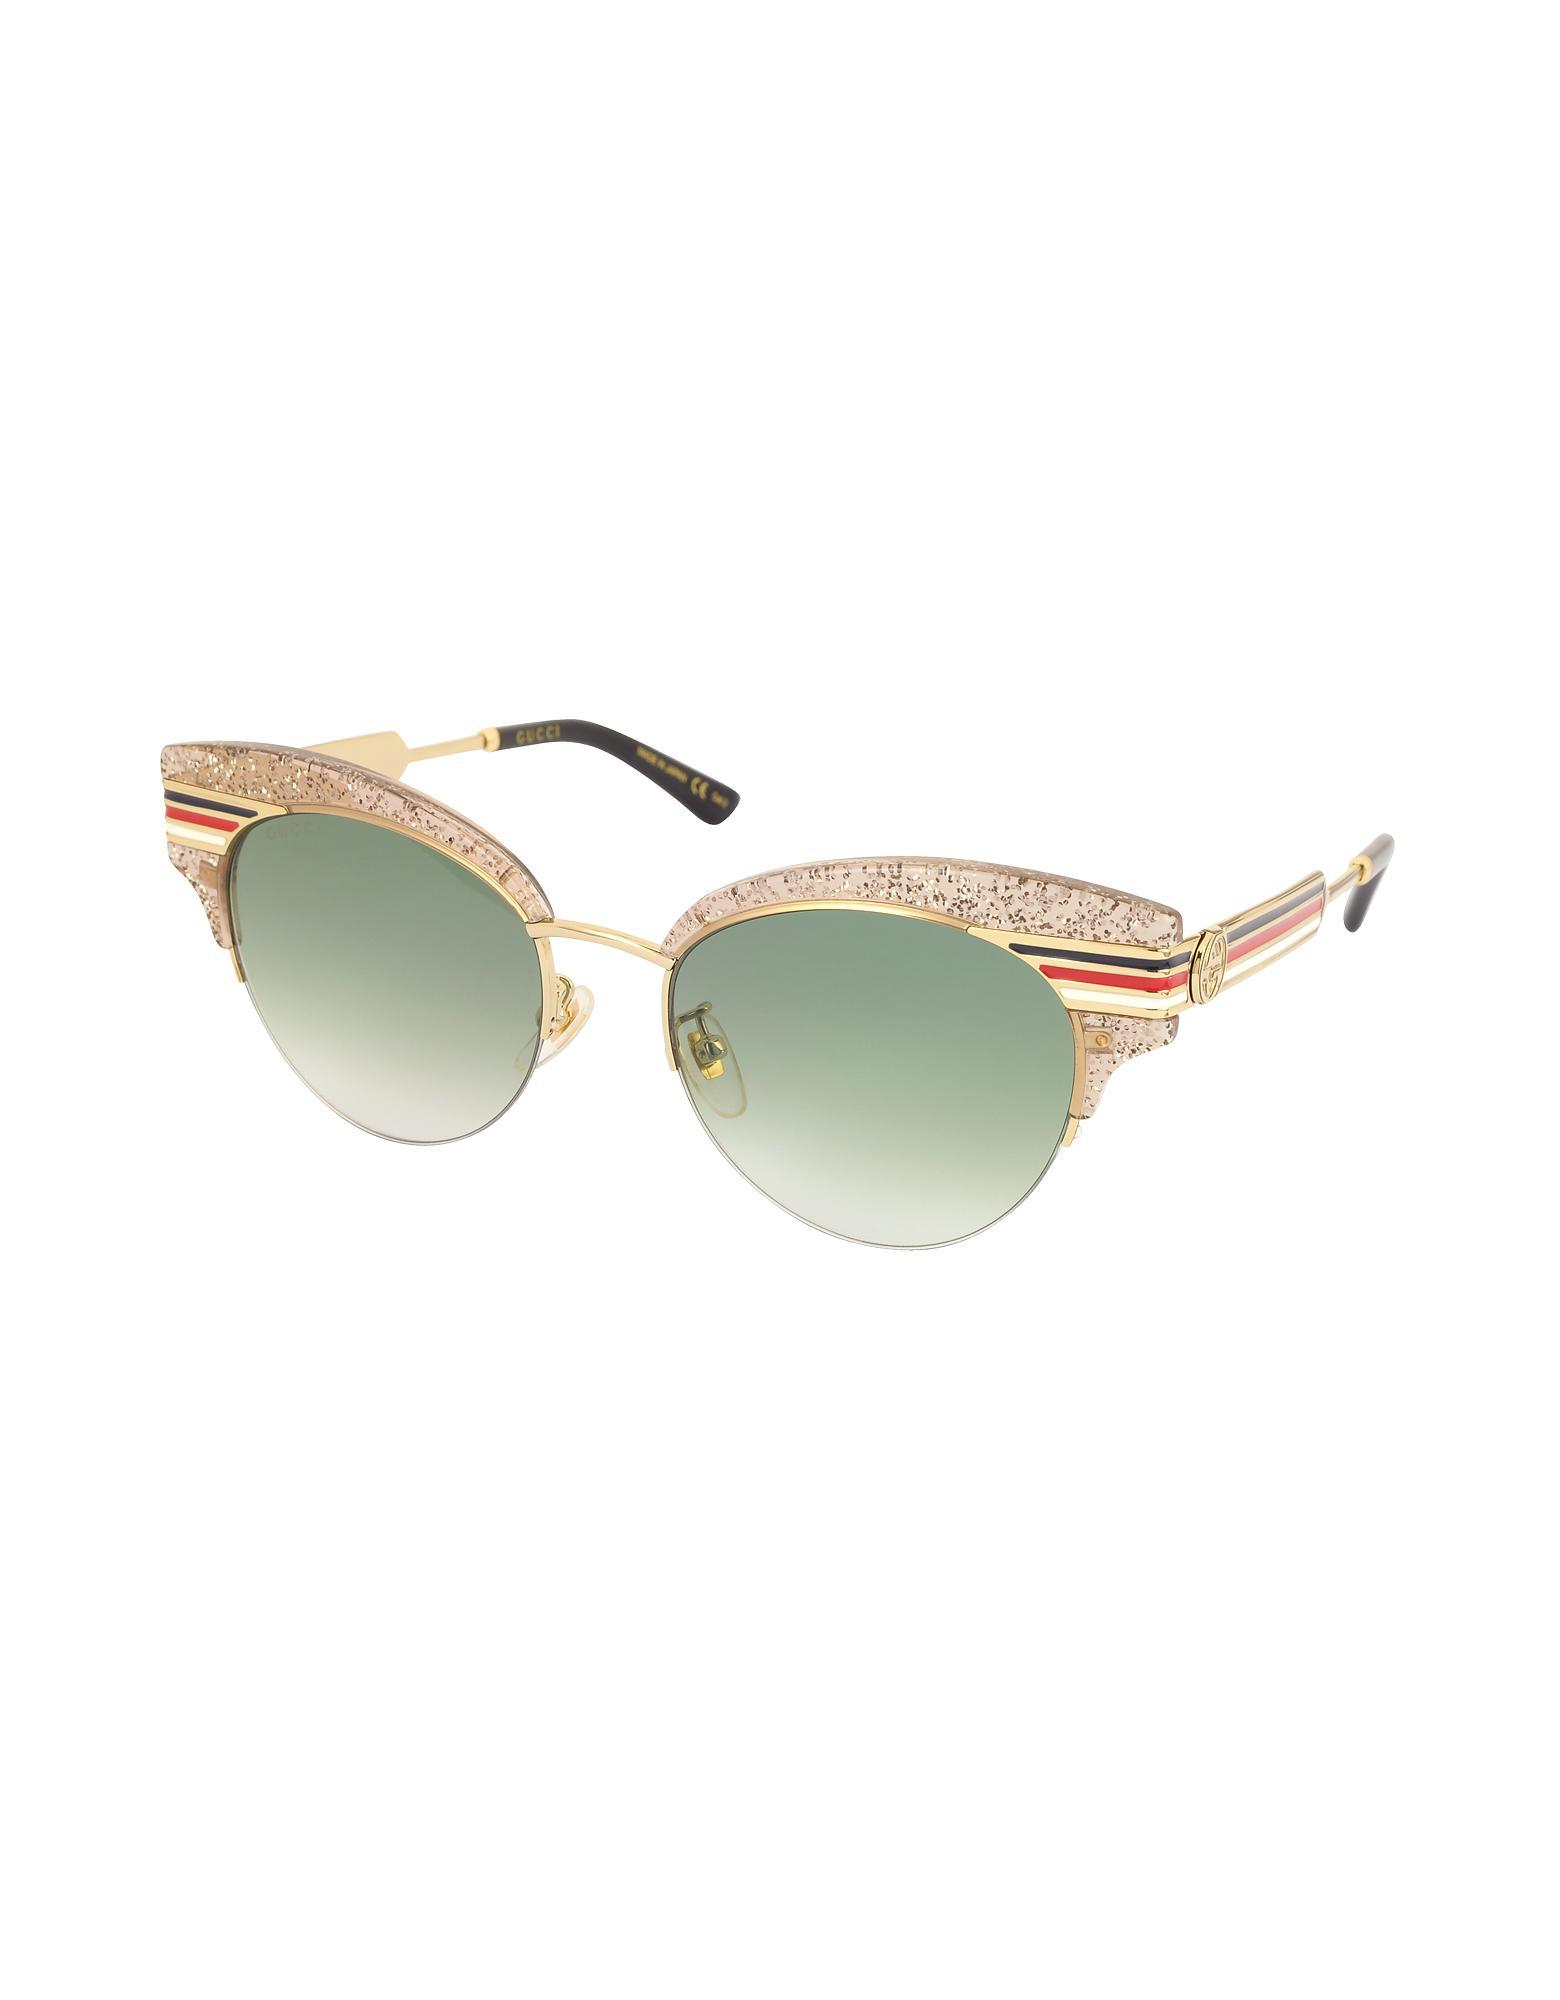 b8867b61a27cf Gucci GG0283S Cat Eye Beige Glitter Acetate Sunglasses W sylvie Web ...